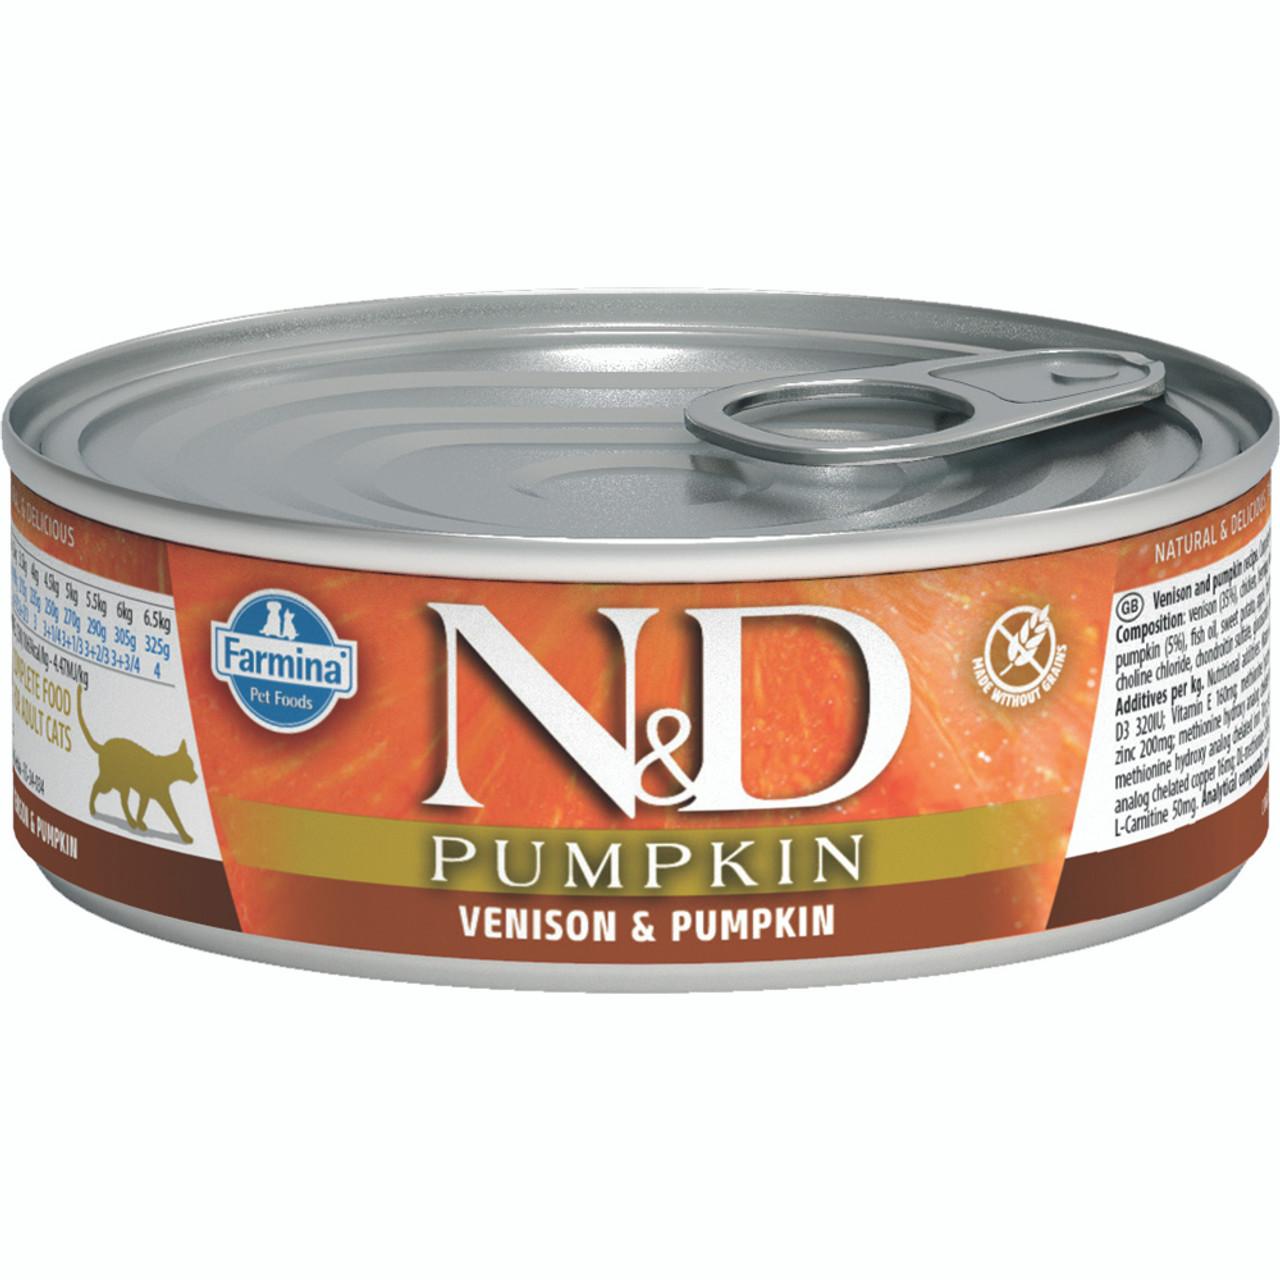 Farmina N&D Pumpkin Venison & Pumpkin Recipe Adult Canned Cat Food